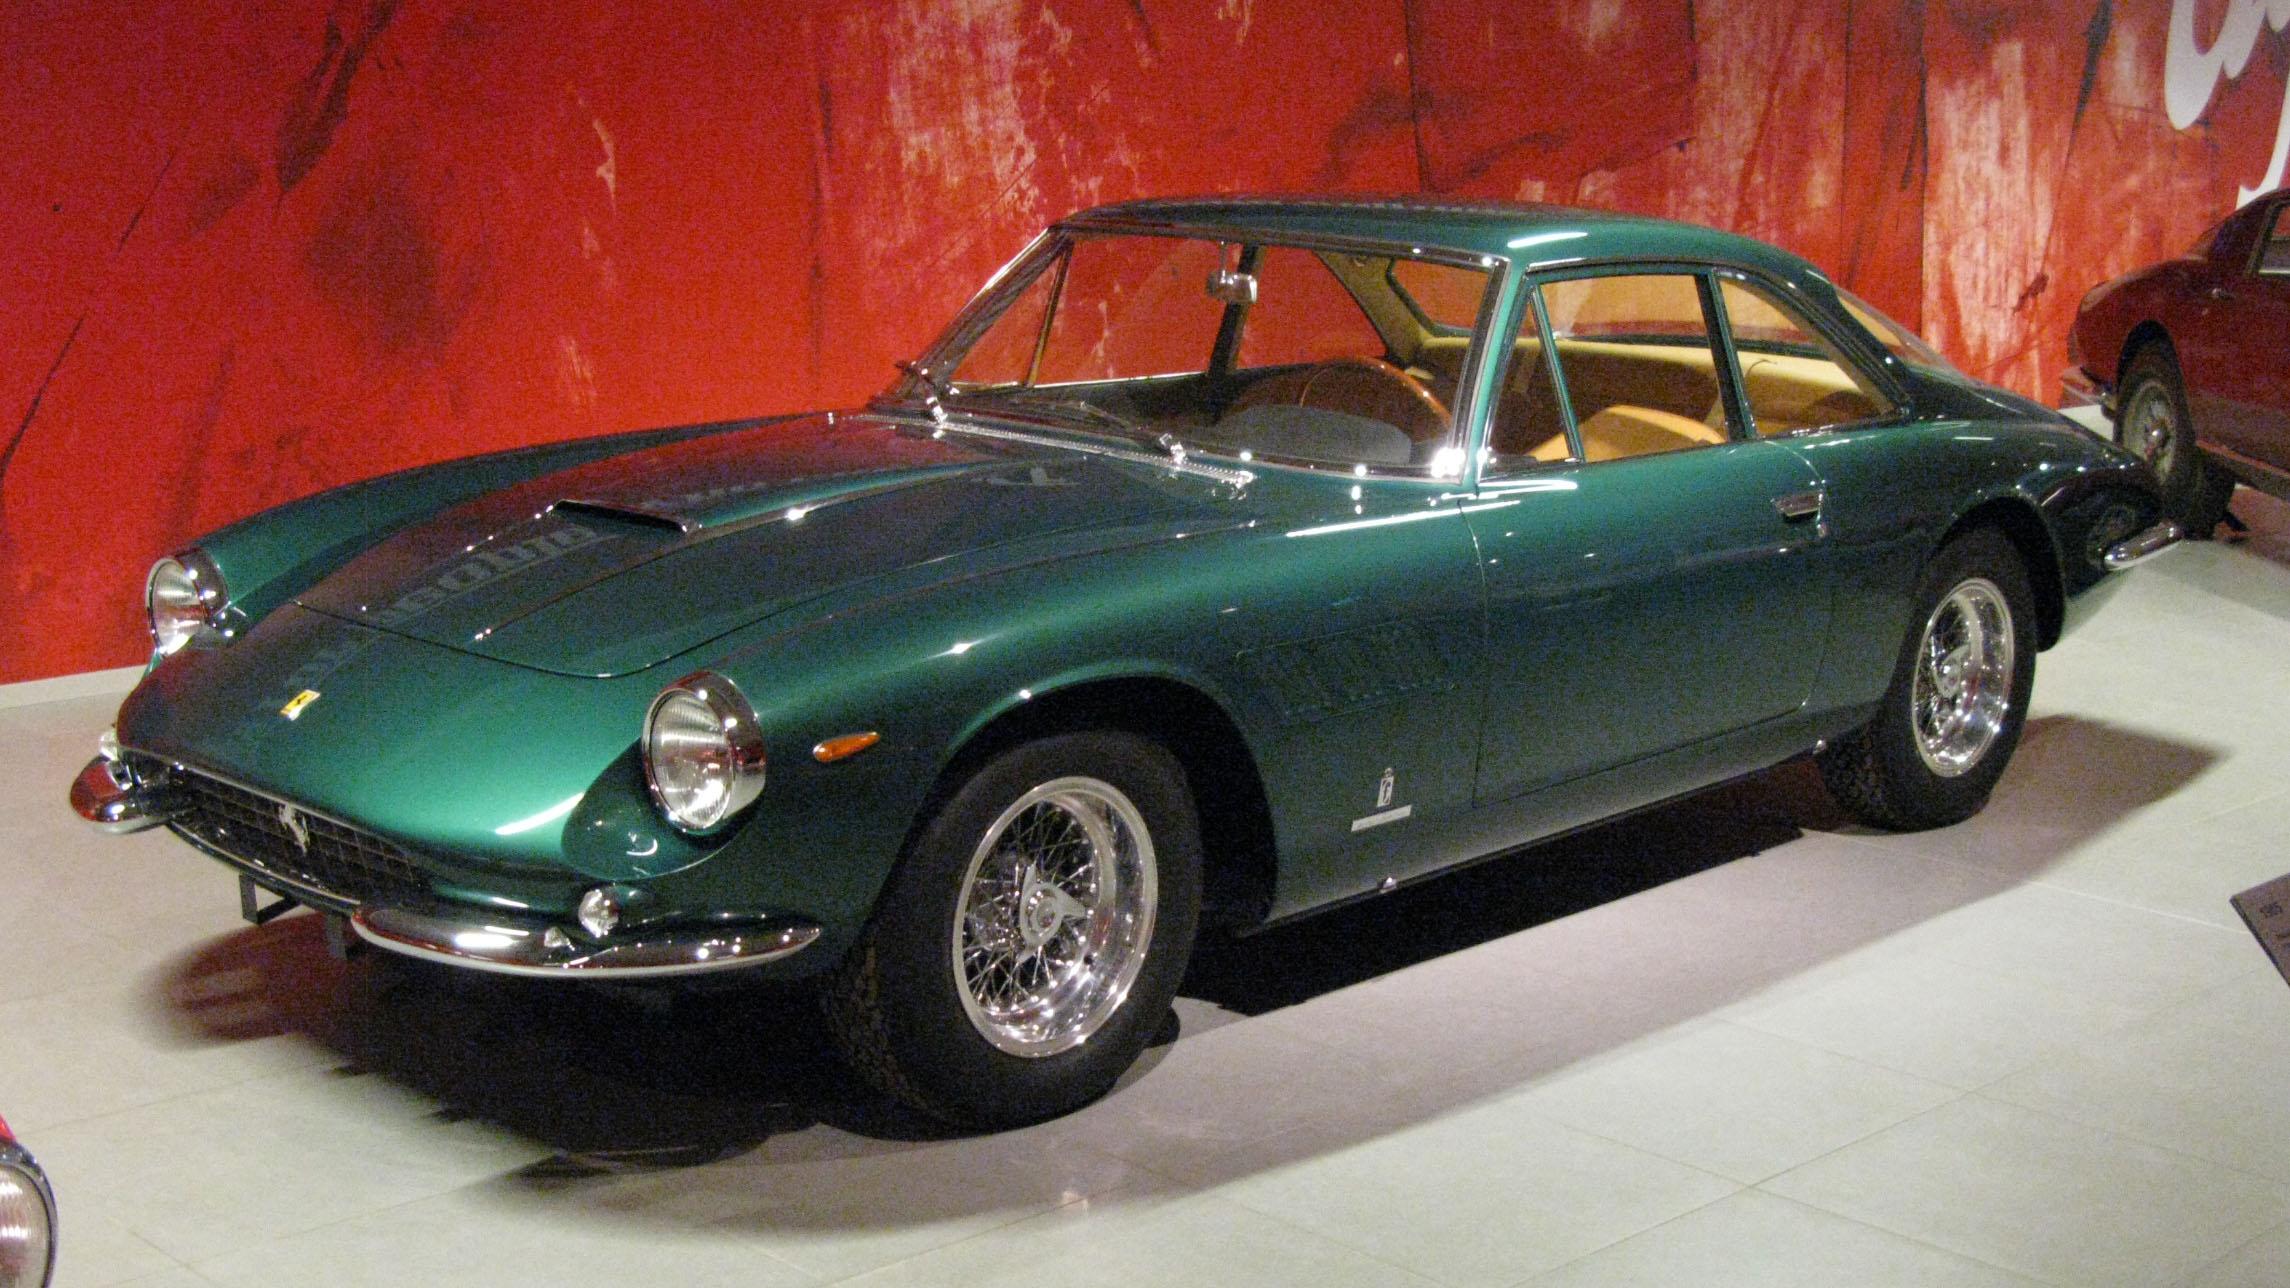 File:1964 Ferrari 500 Superfast.jpg - Wikipedia